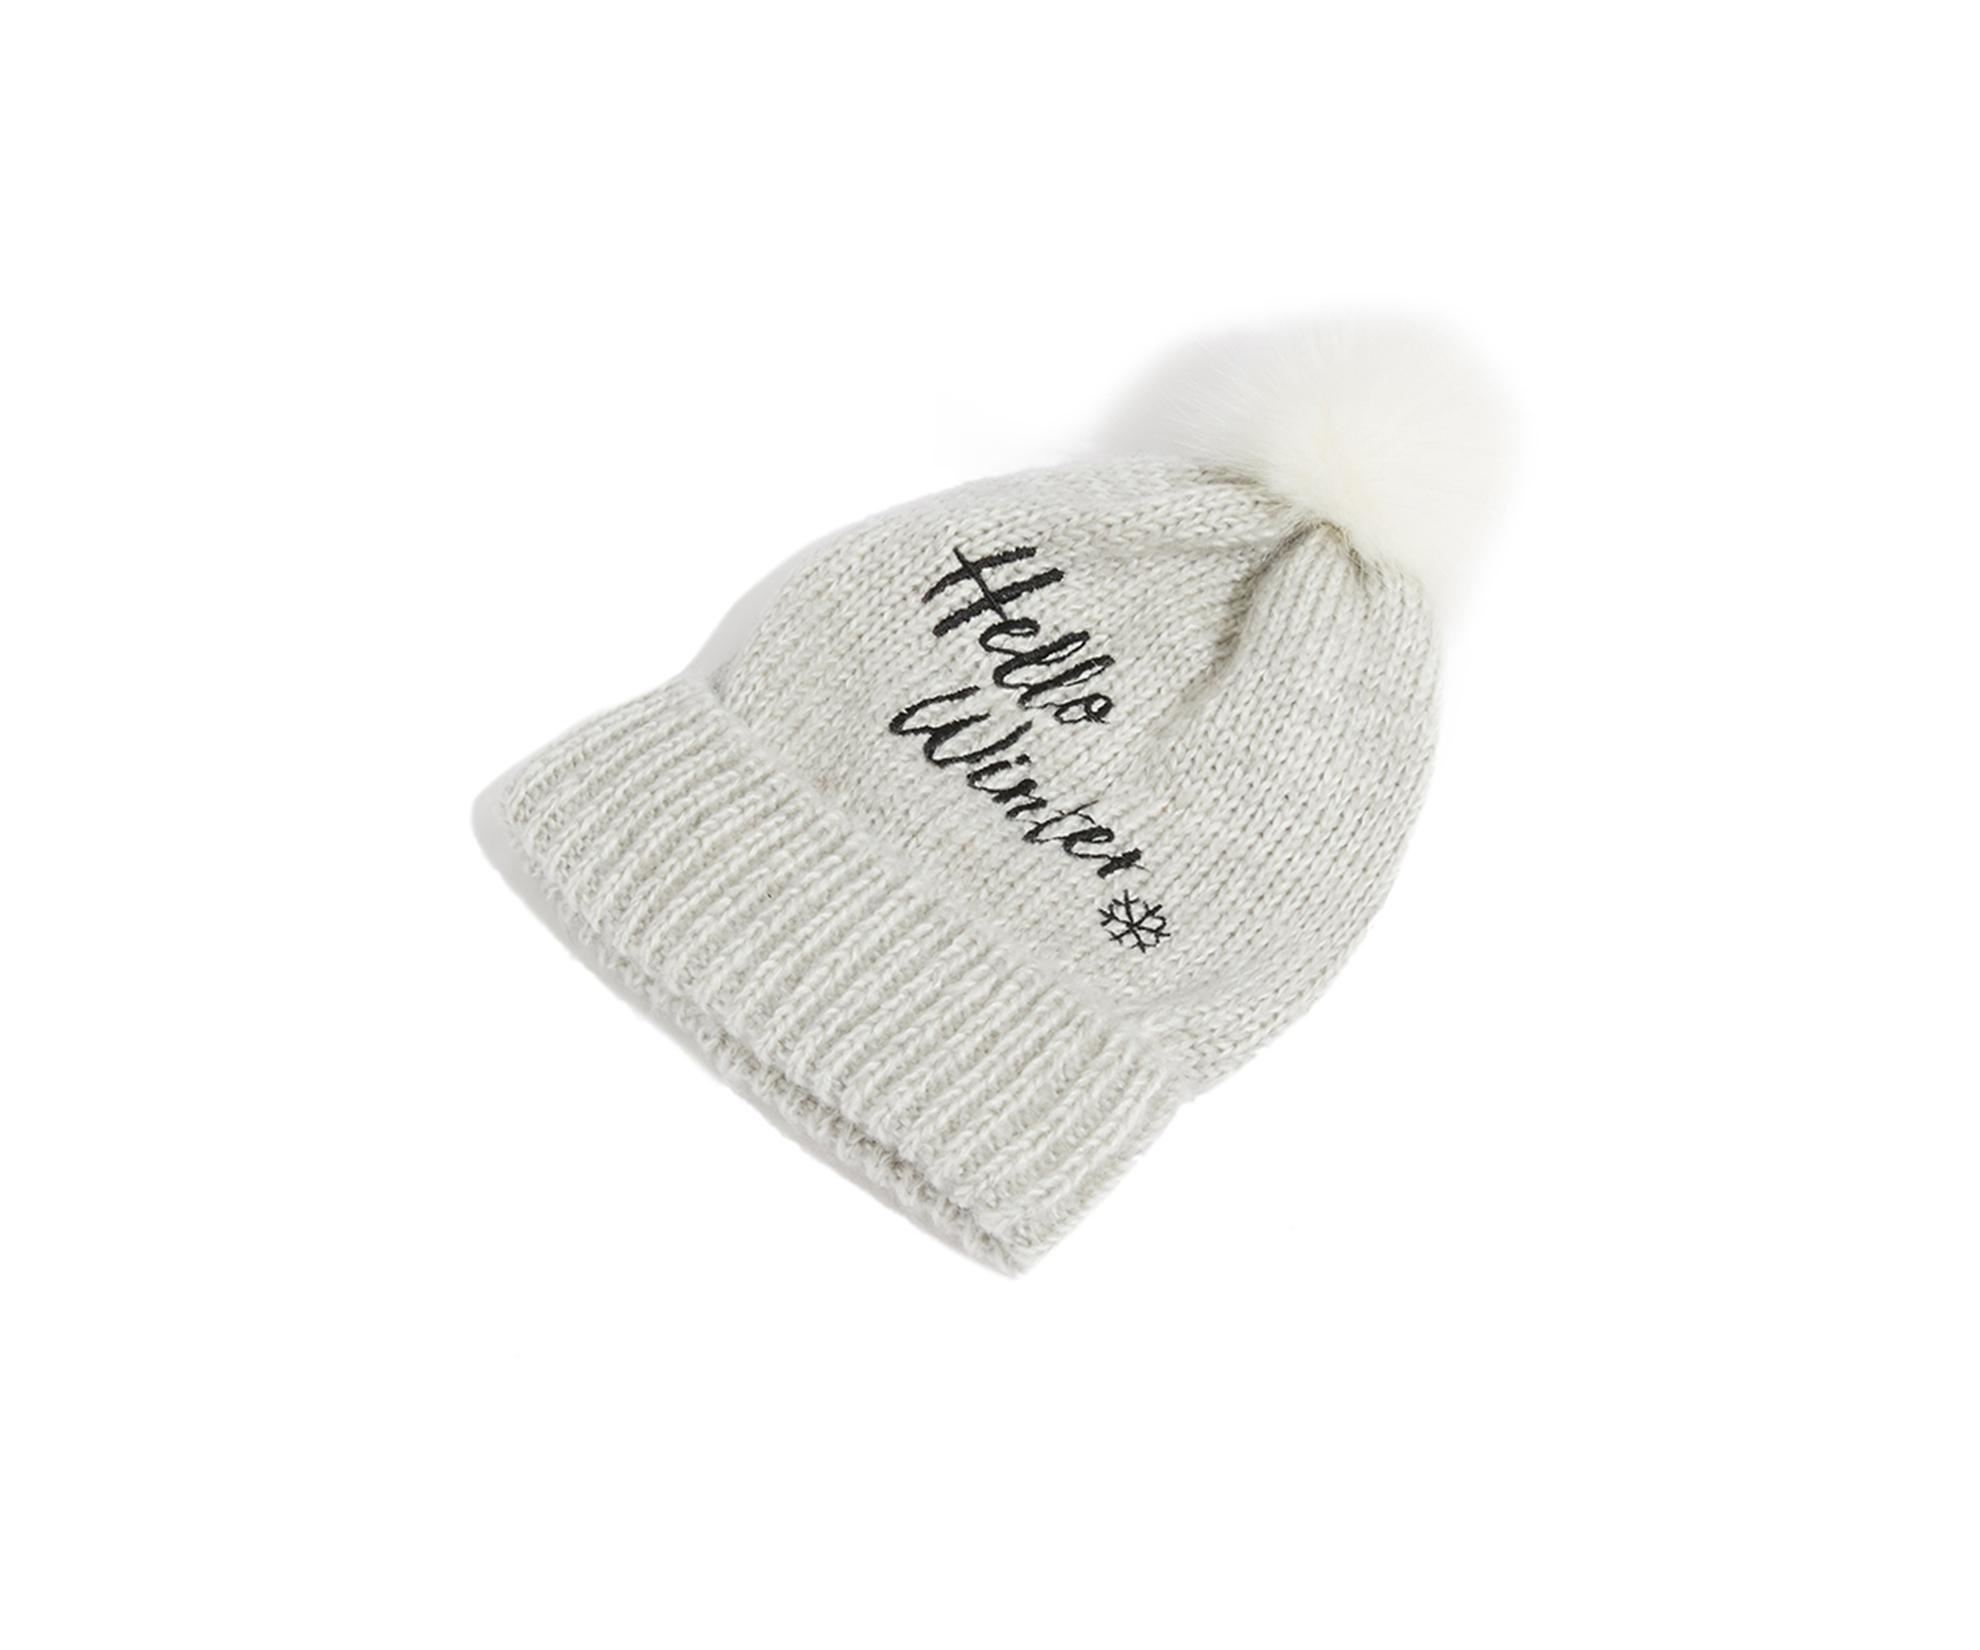 e152317911a ... Winter Beanie Hat - Lyst. View fullscreen